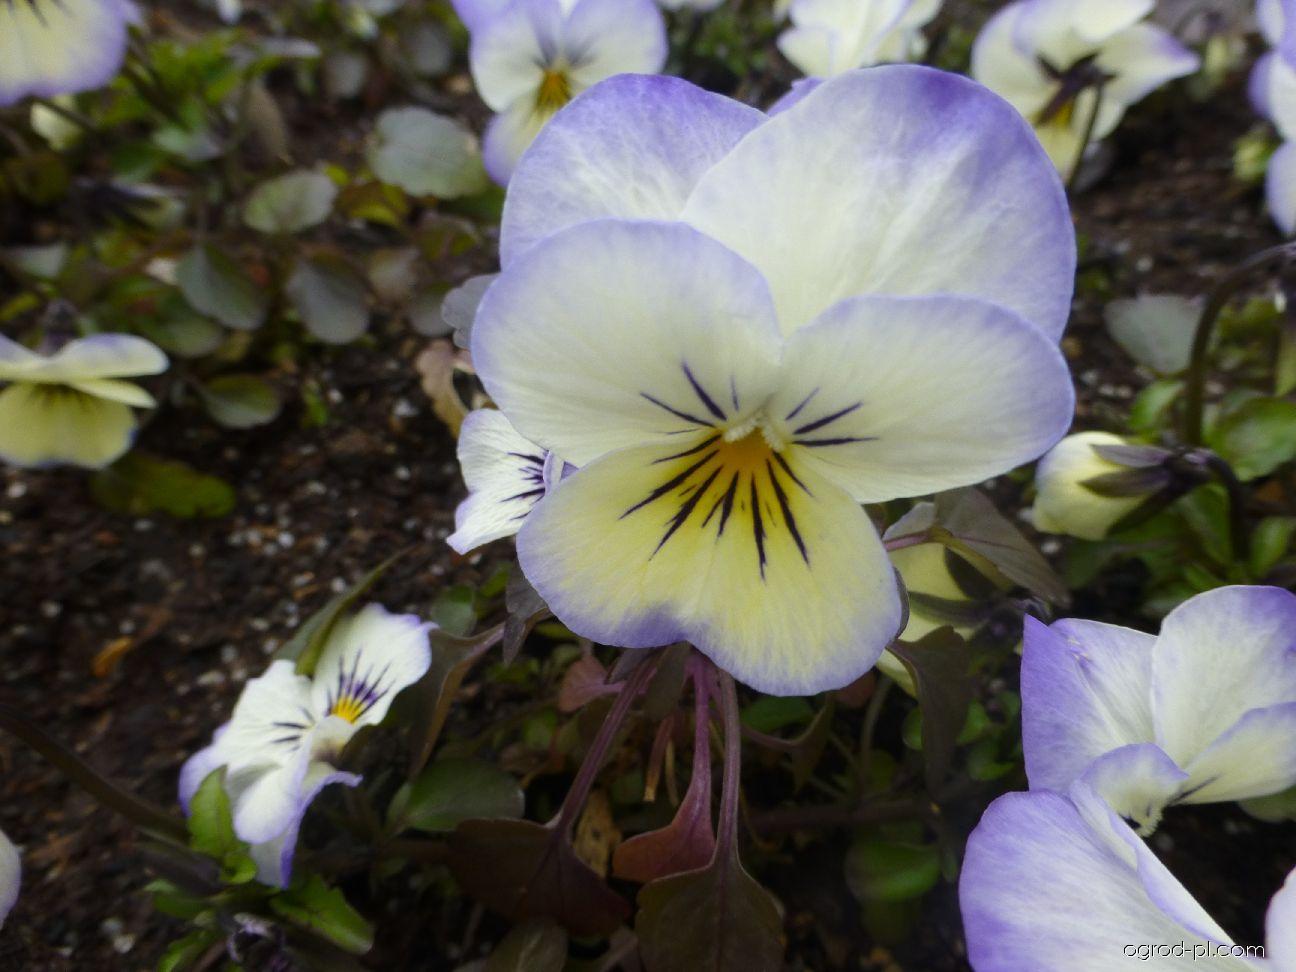 Fiołek rogaty - Viola cornuta Twix Coconut